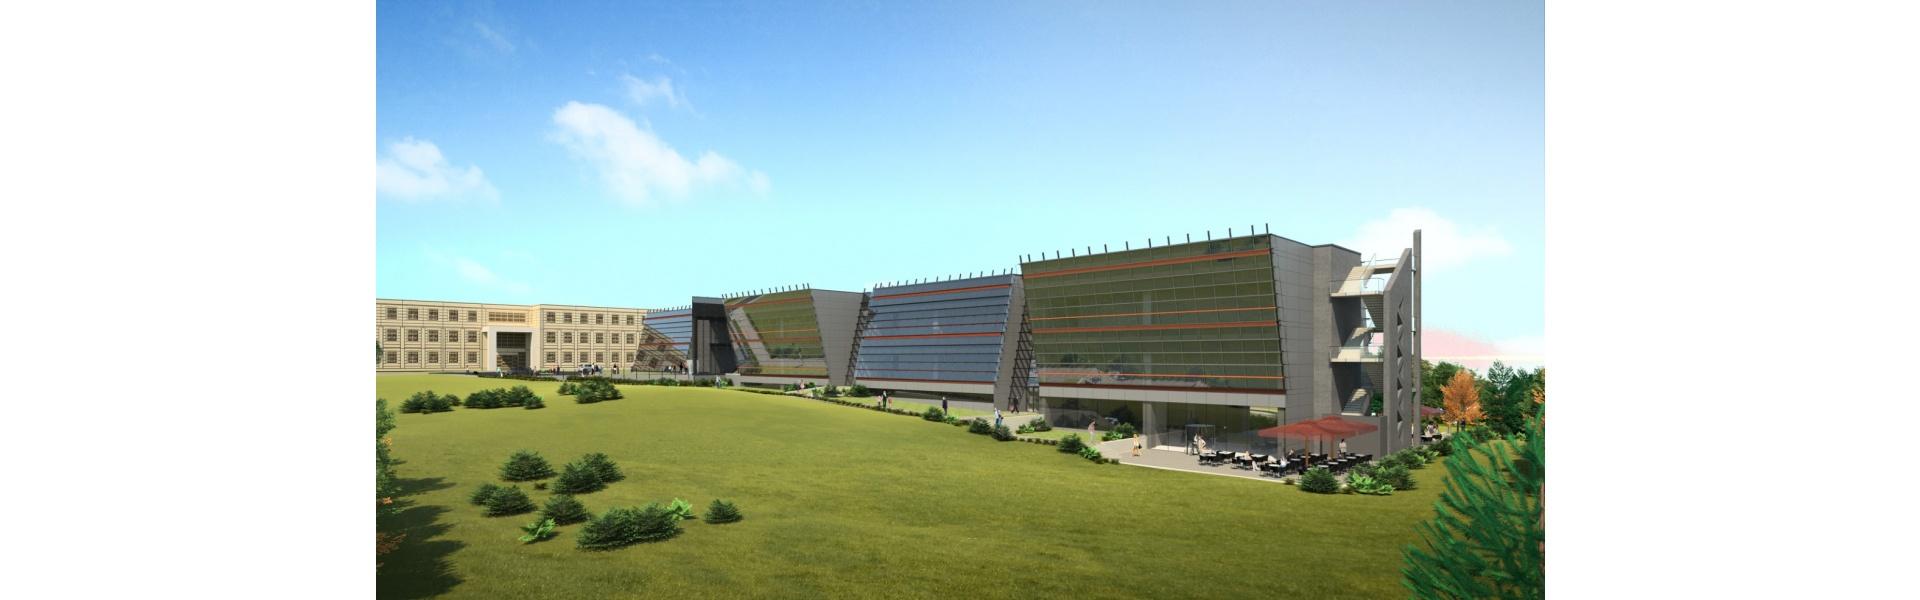 Bogazici University Kandilli Science And Technology Complex 002